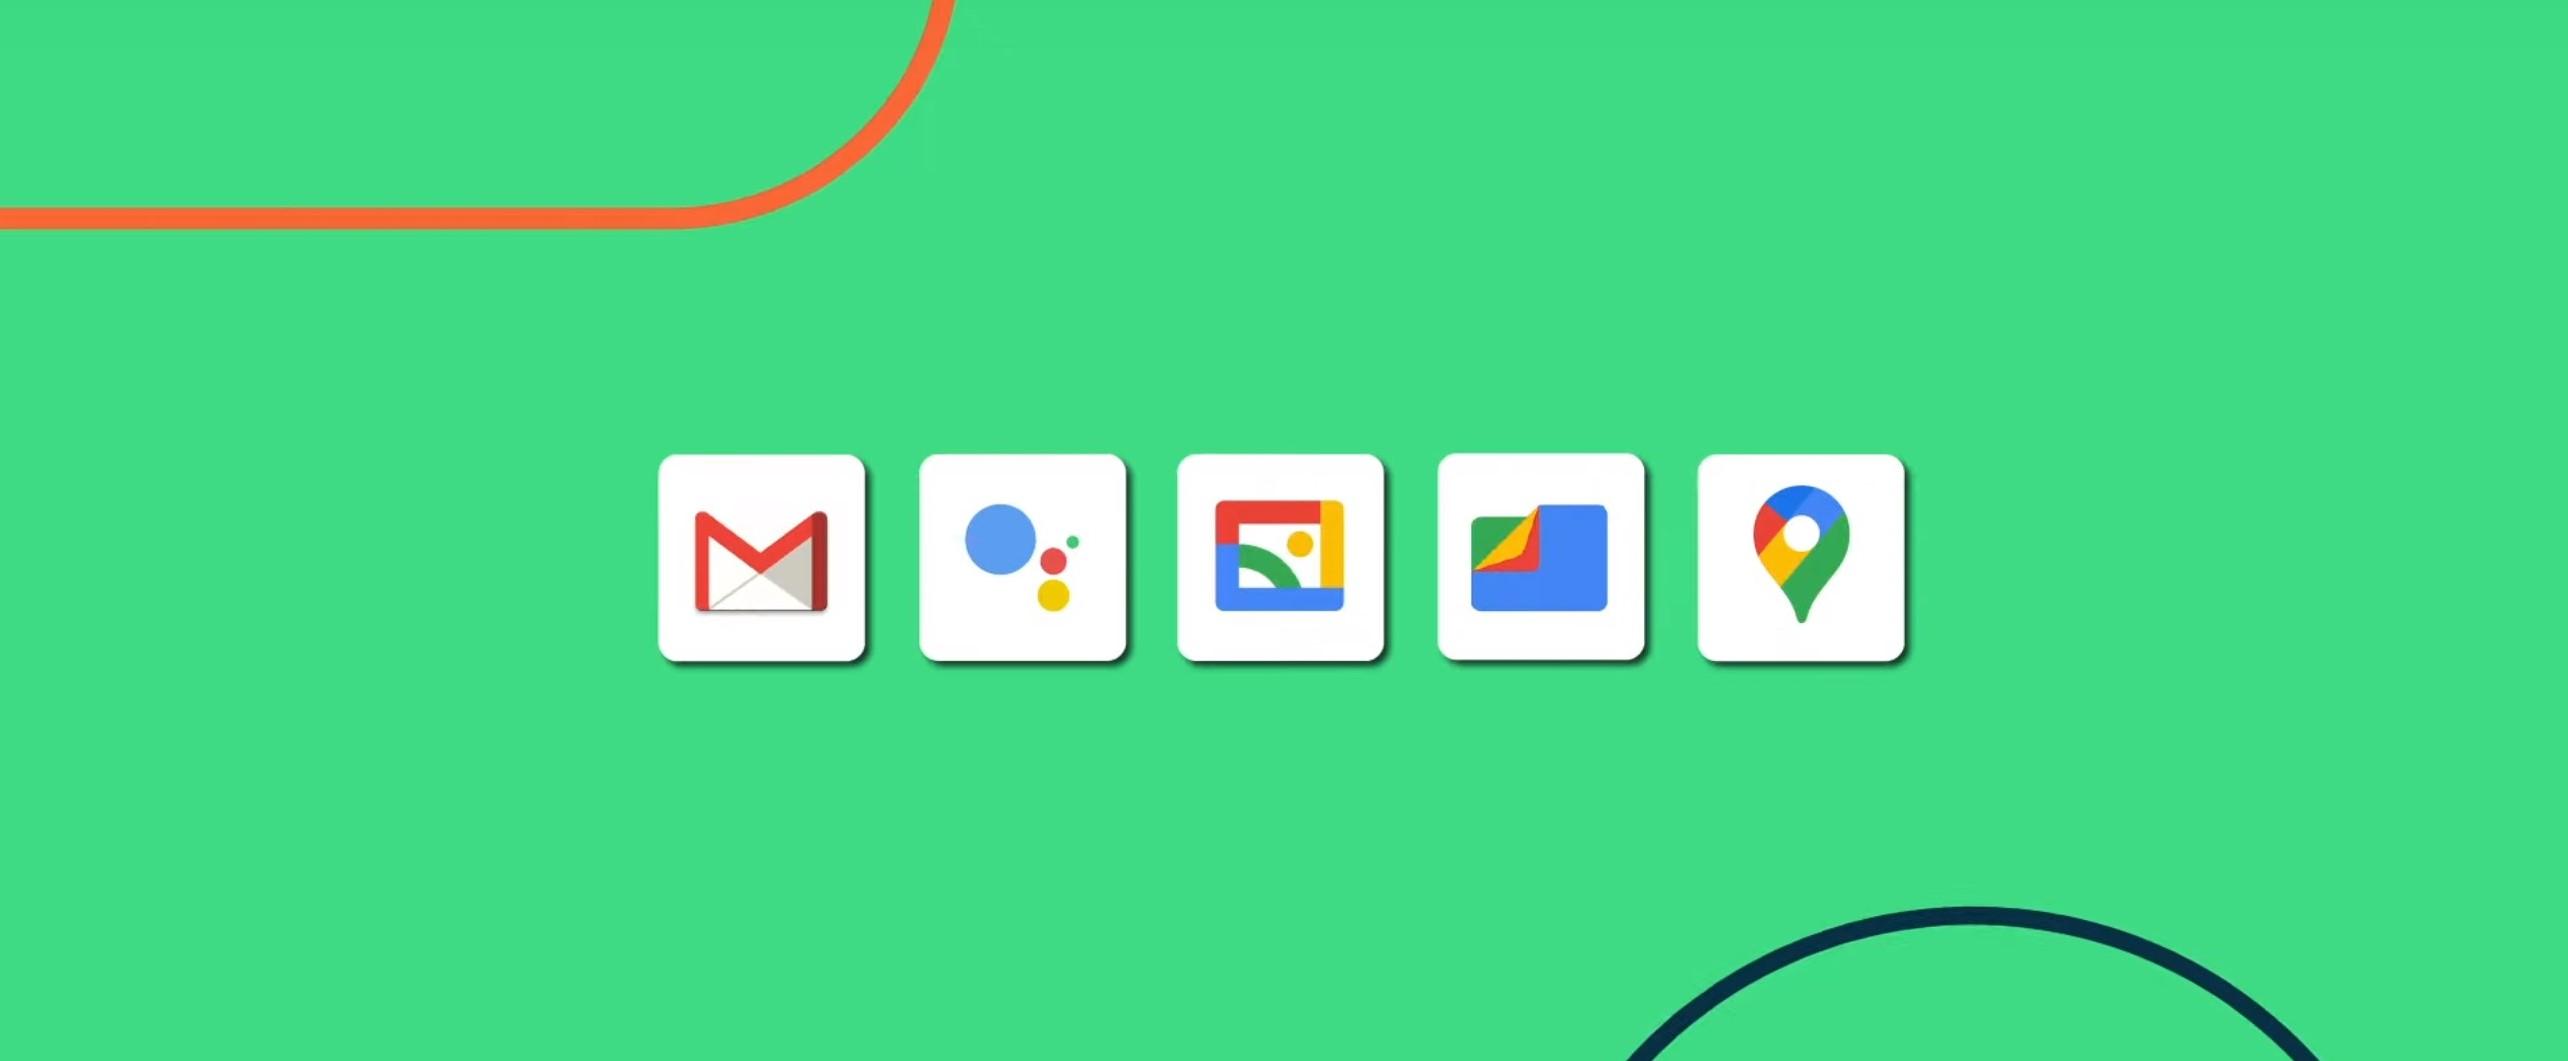 Android Go - aplikacje